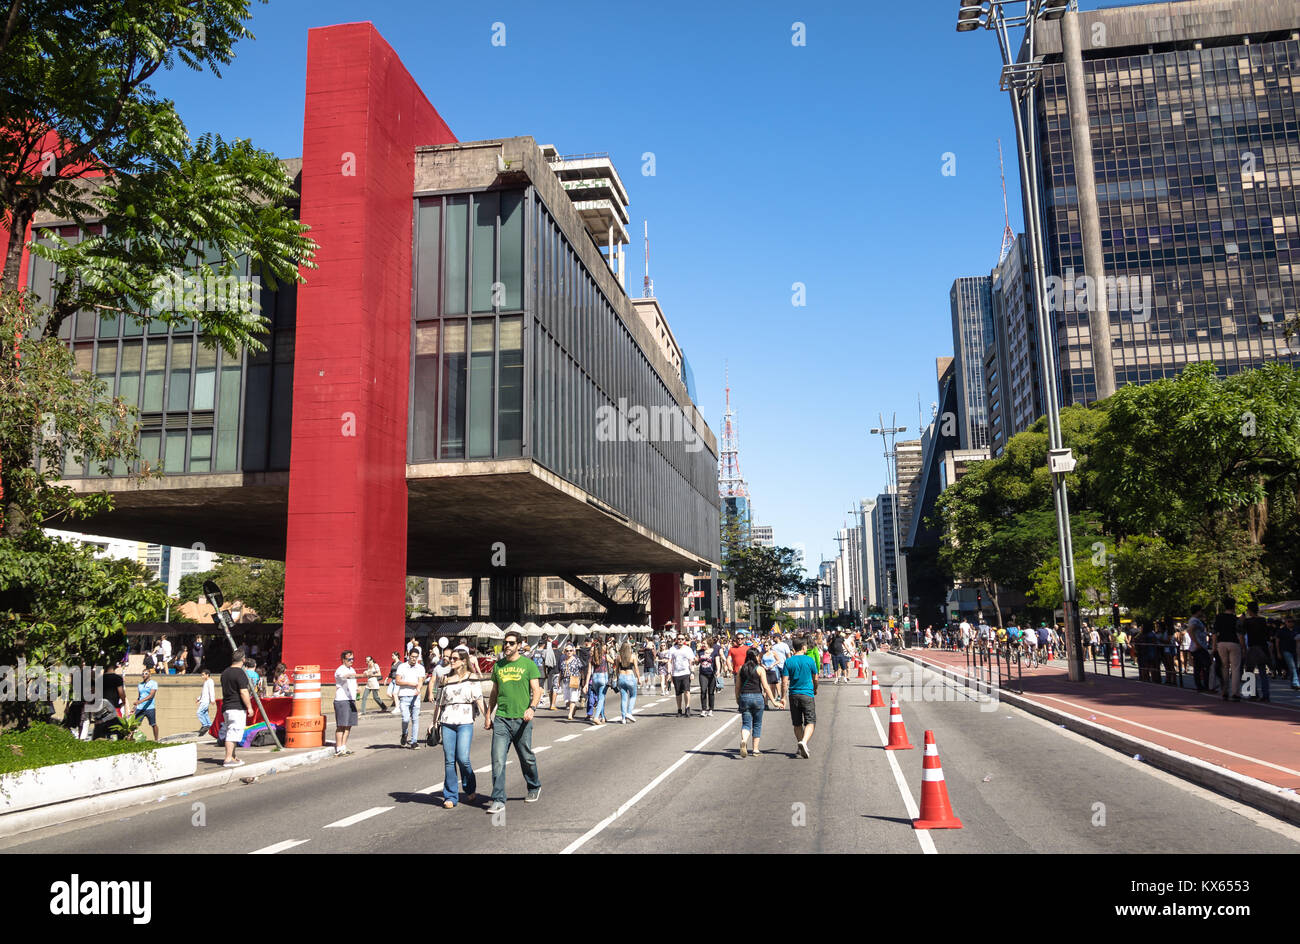 Paulista Avenue closed to cars on sunday and MASP (Sao Paulo Museum of Art) - Sao Paulo, Brazil - Stock Image